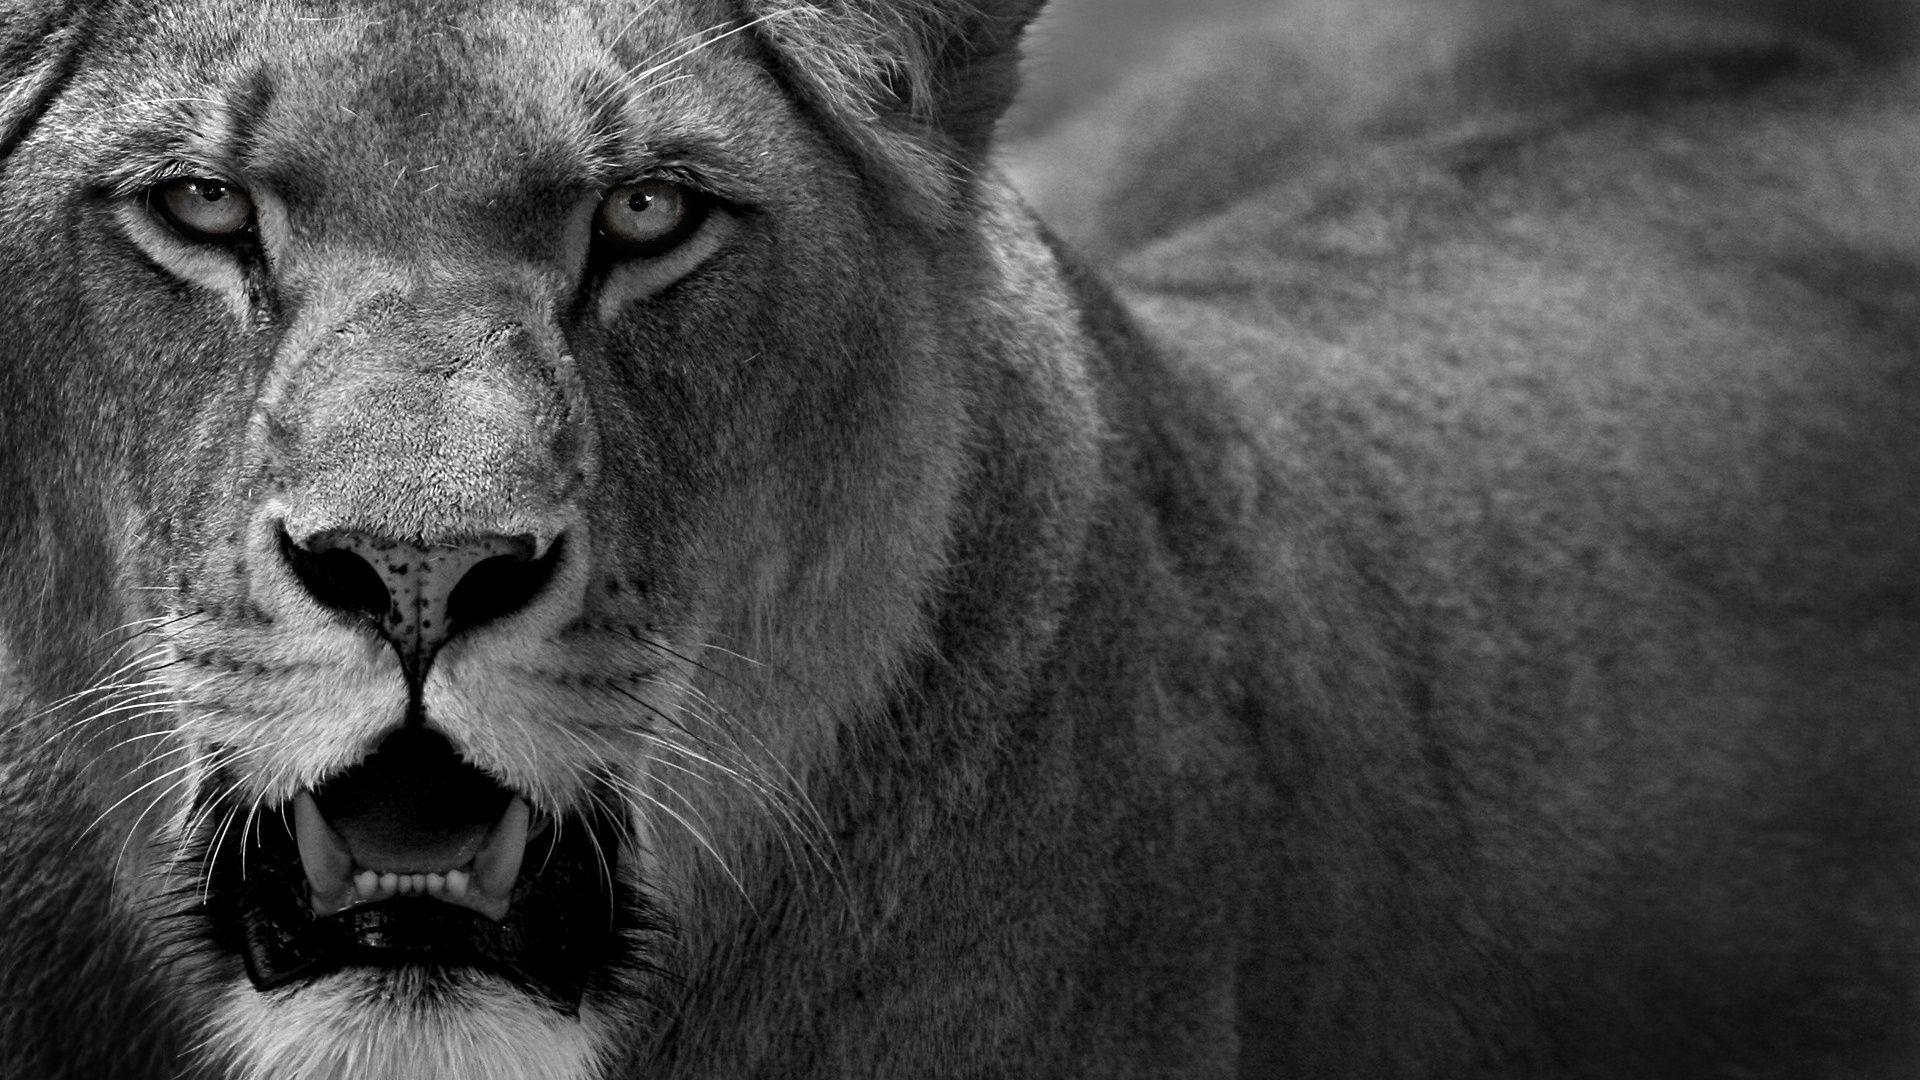 Lion Black And White Animal Image